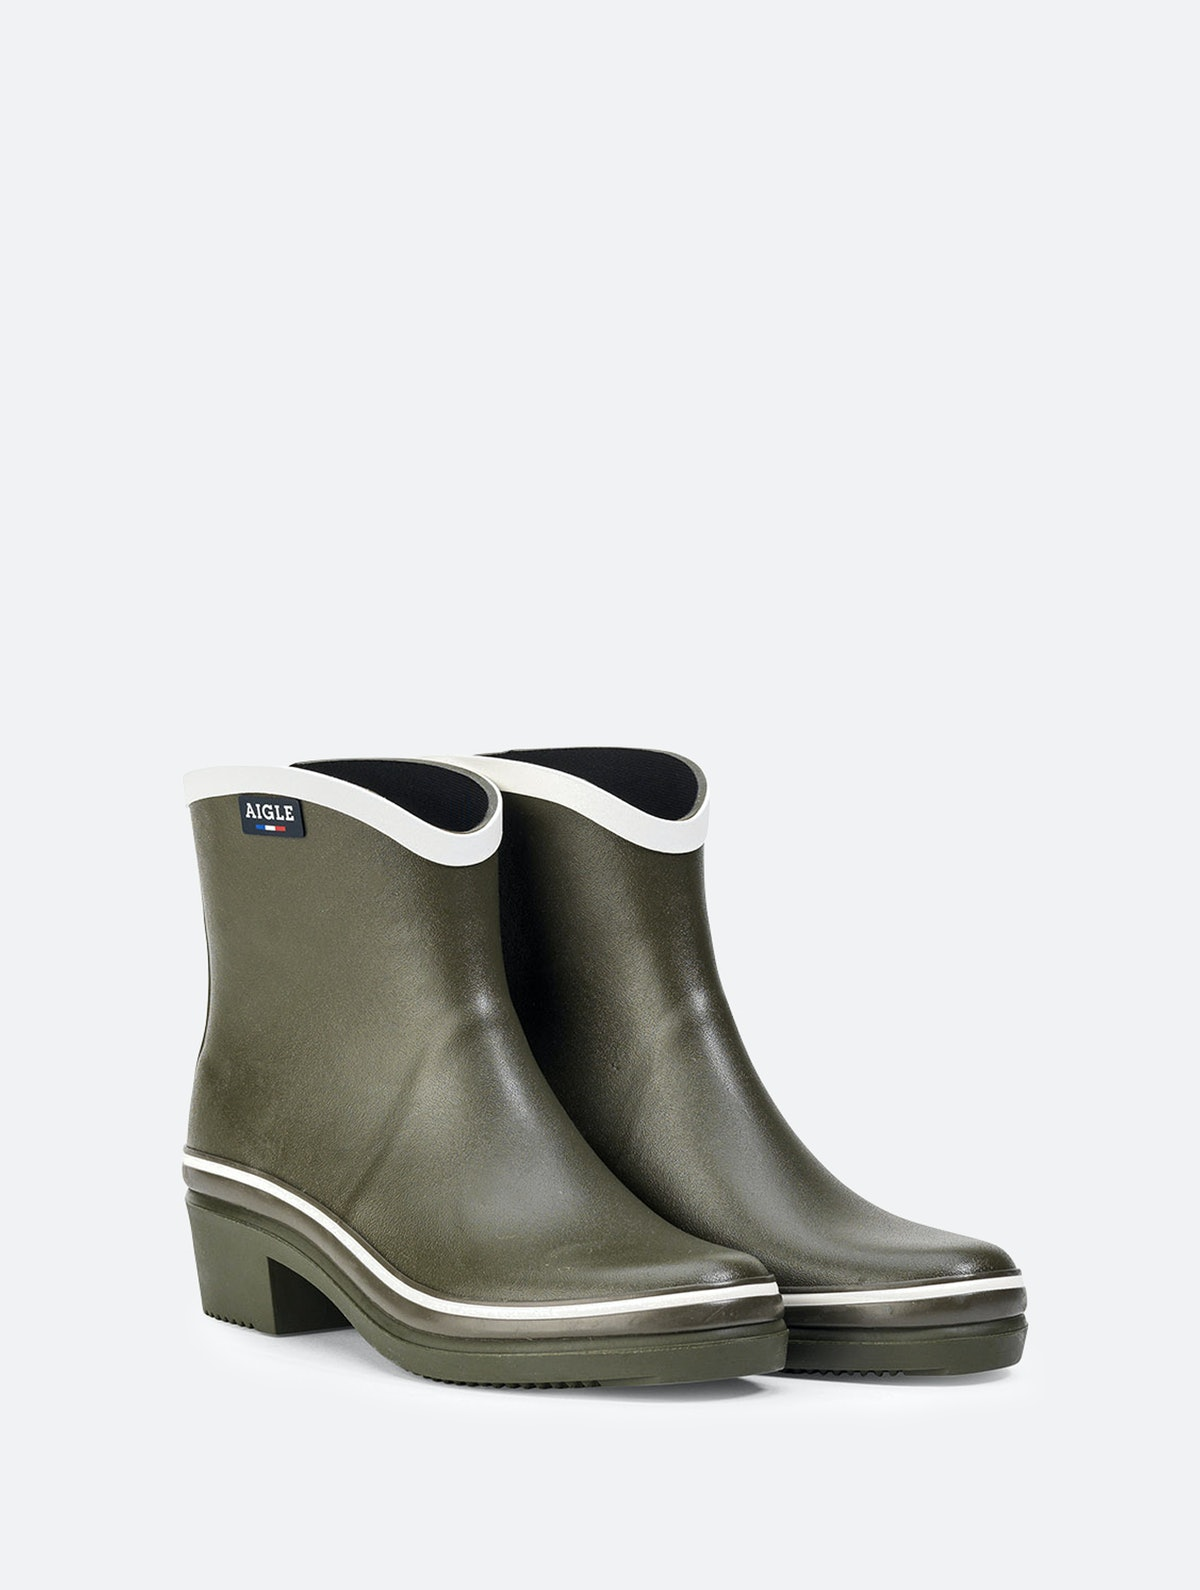 Aigle Women's Rubber Ankle Boots